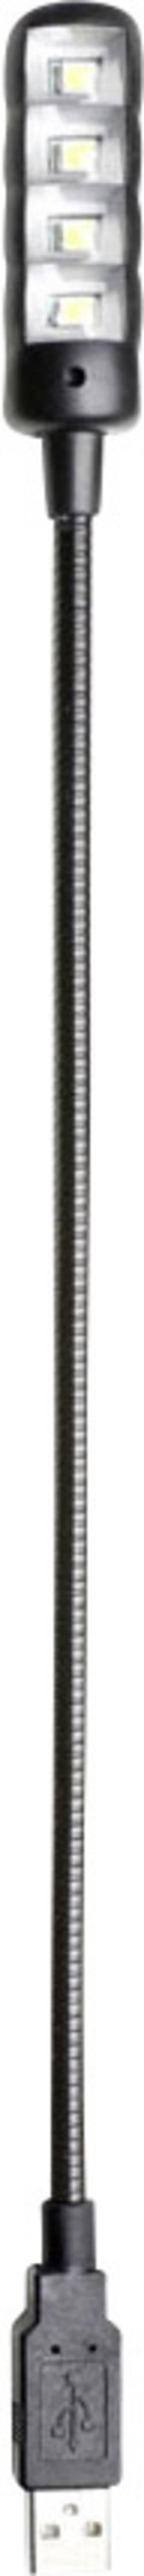 Lampe à col de cygne Adam Hall SLED 1 Ultra USB 1 pc(s)